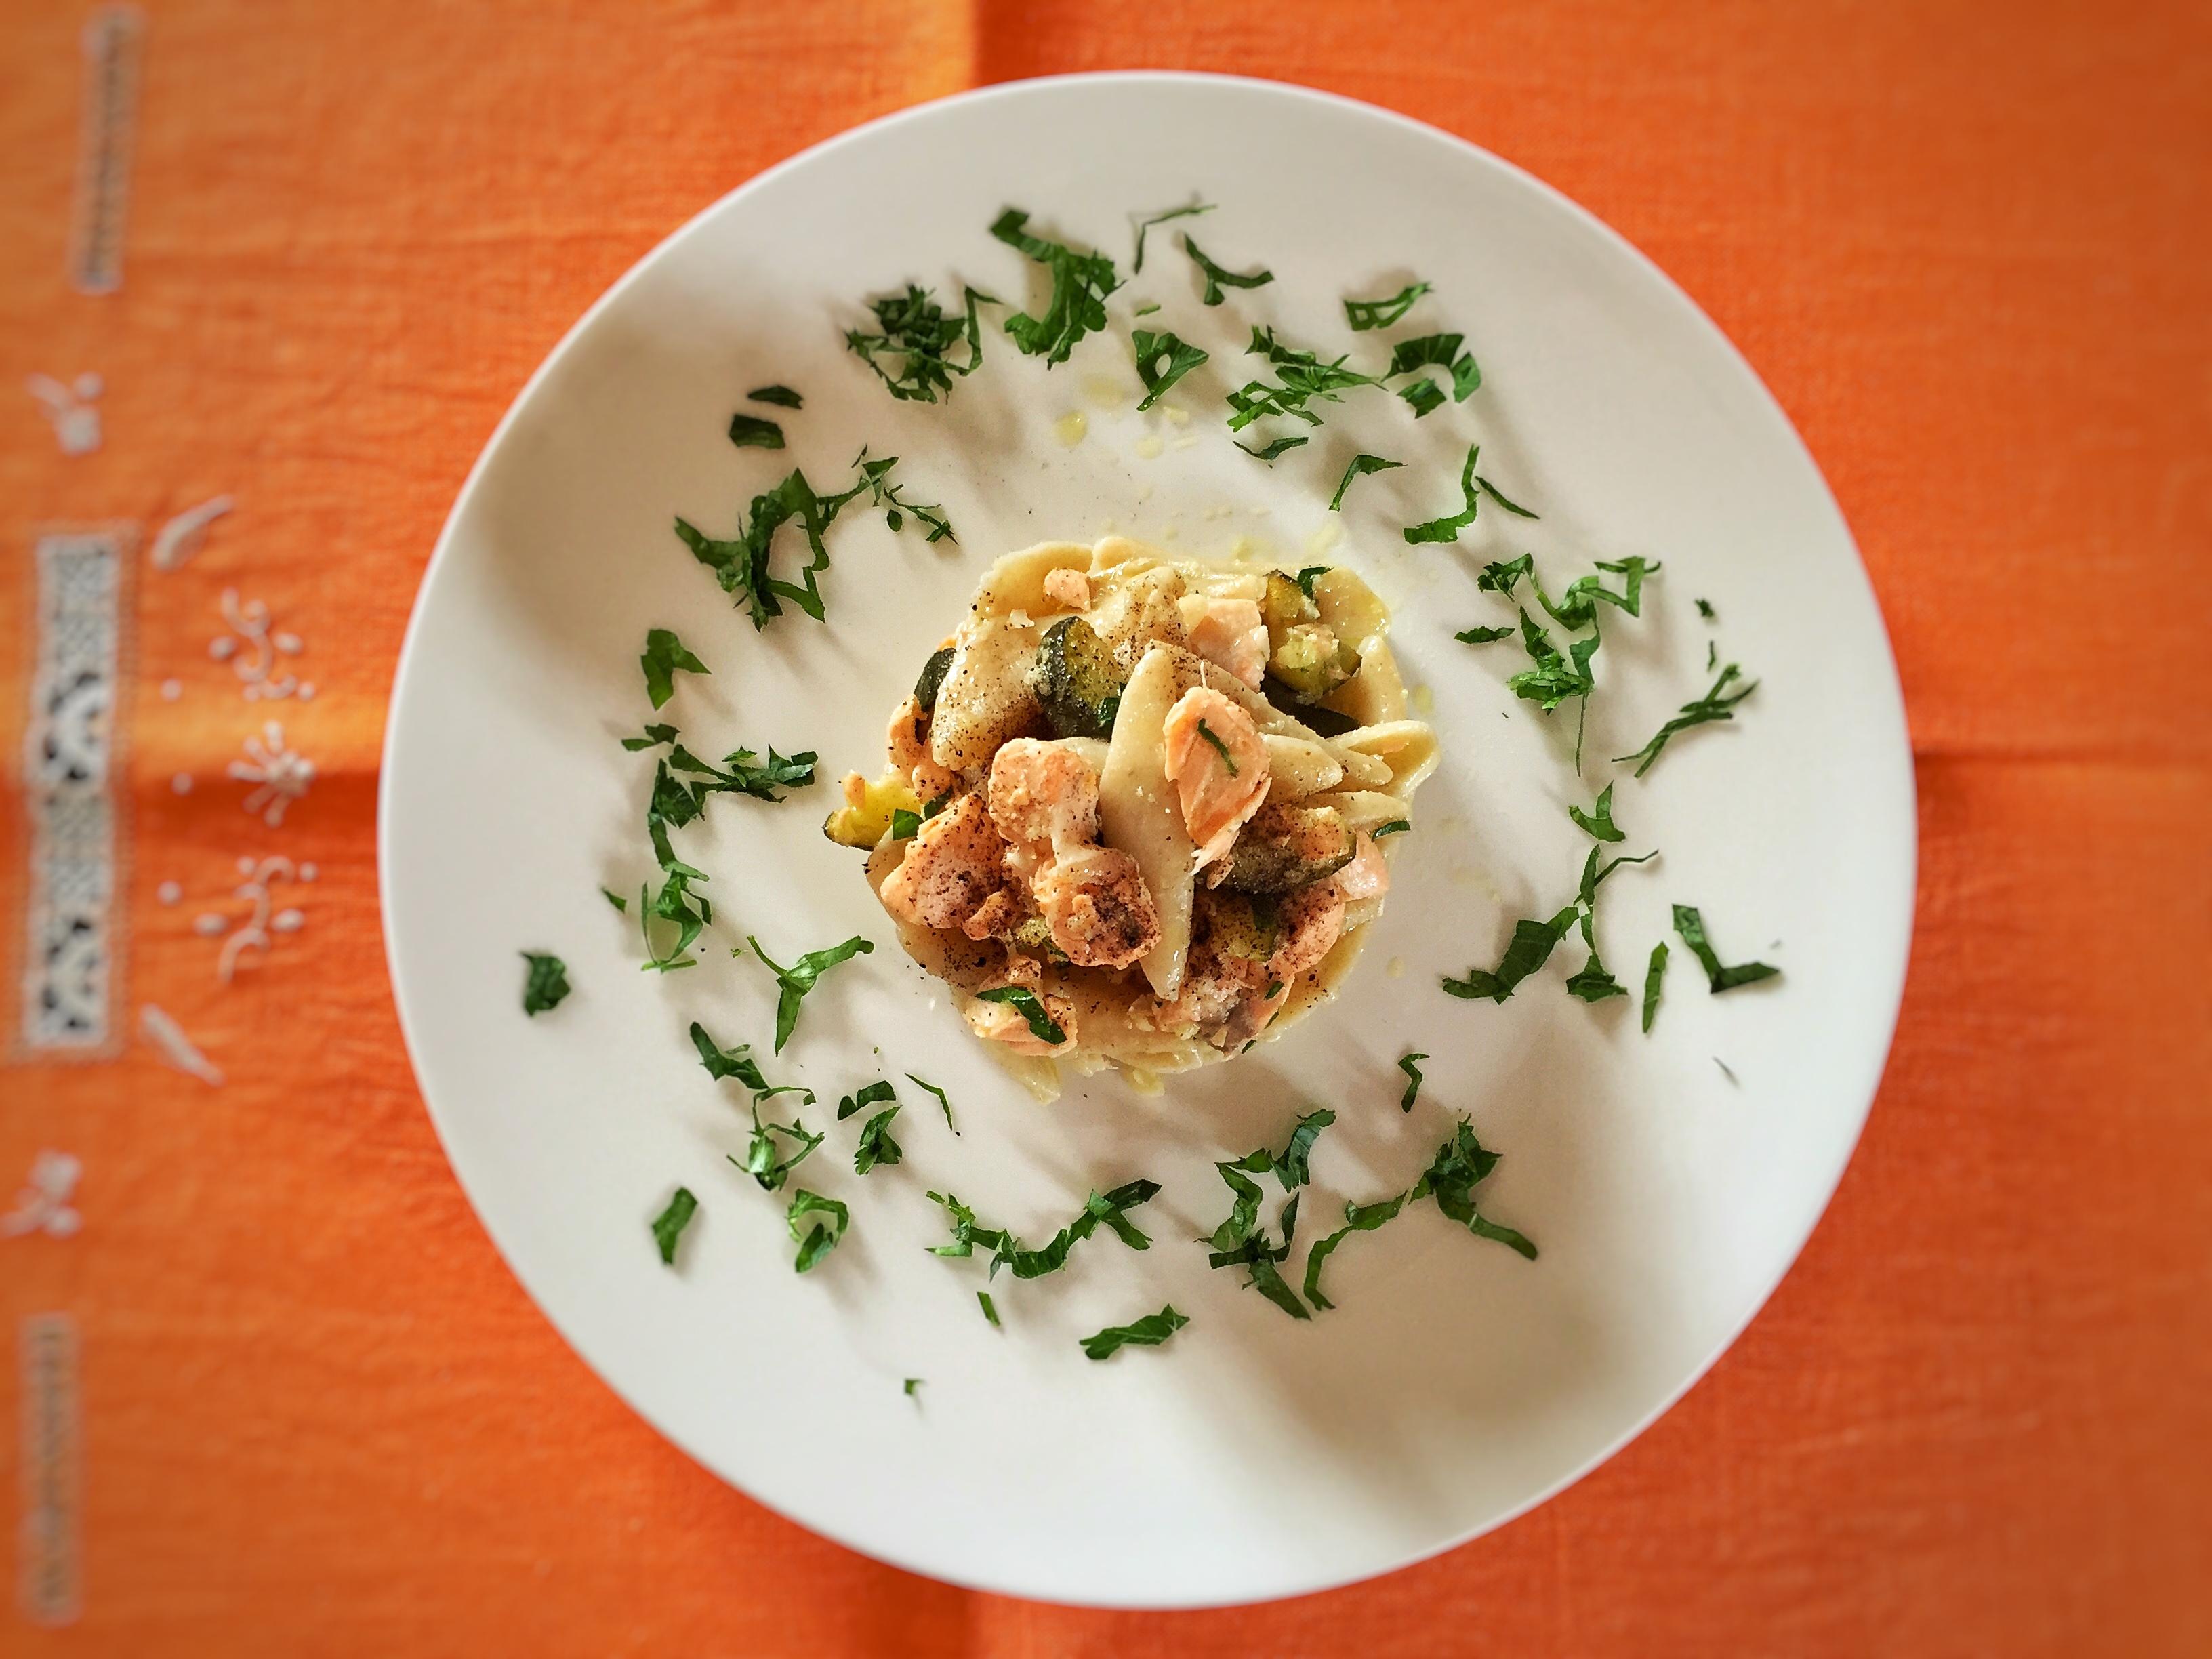 Maccheroni integrali con salmone, zucchine e yogurt